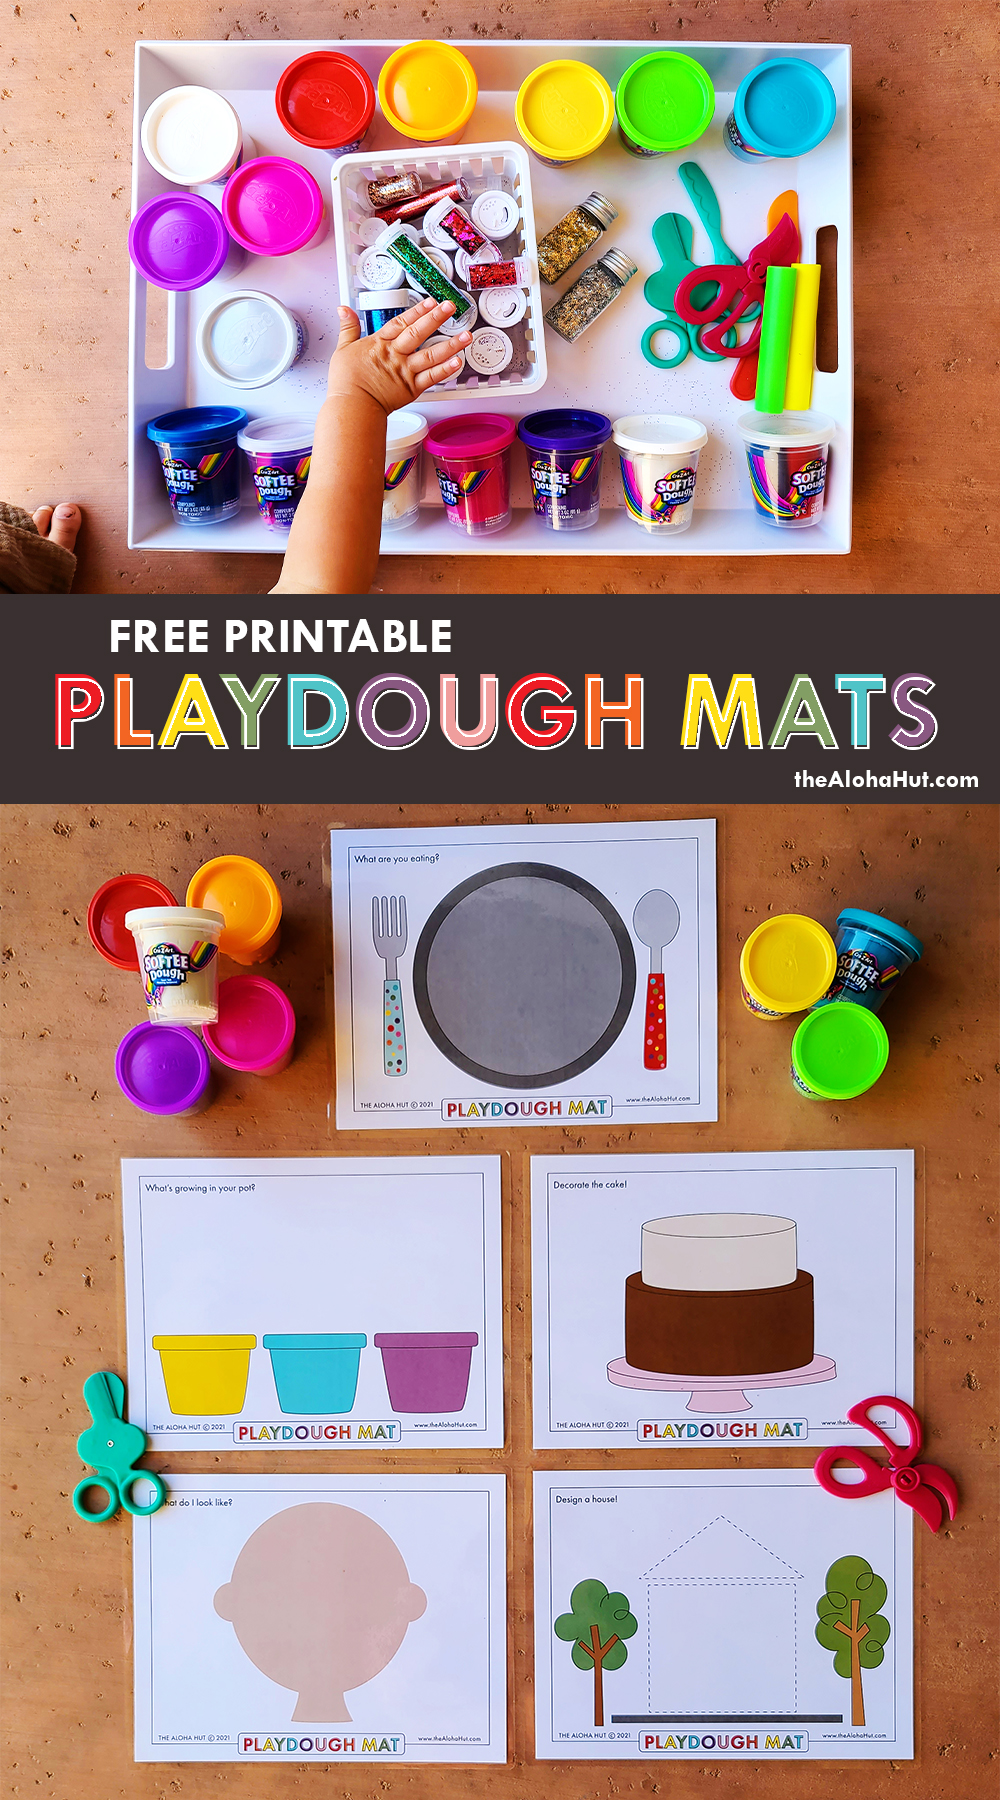 Free Printable PLAYDOUGH MATS 2 by the Aloha Hut